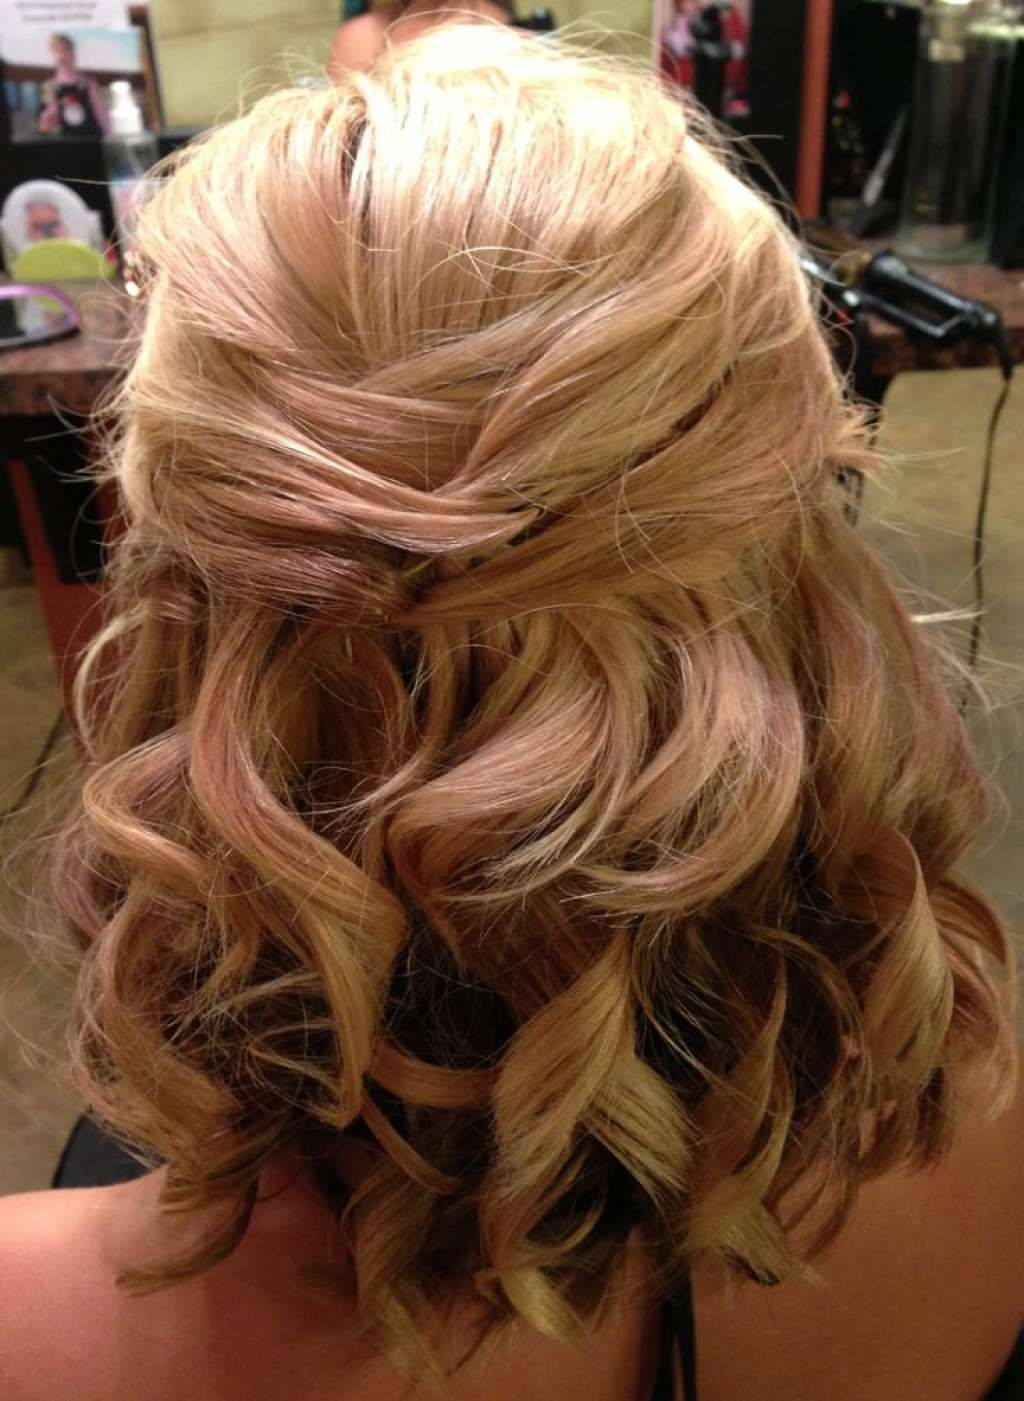 curly hairstyle for medium length hair :: one1lady :: #hair